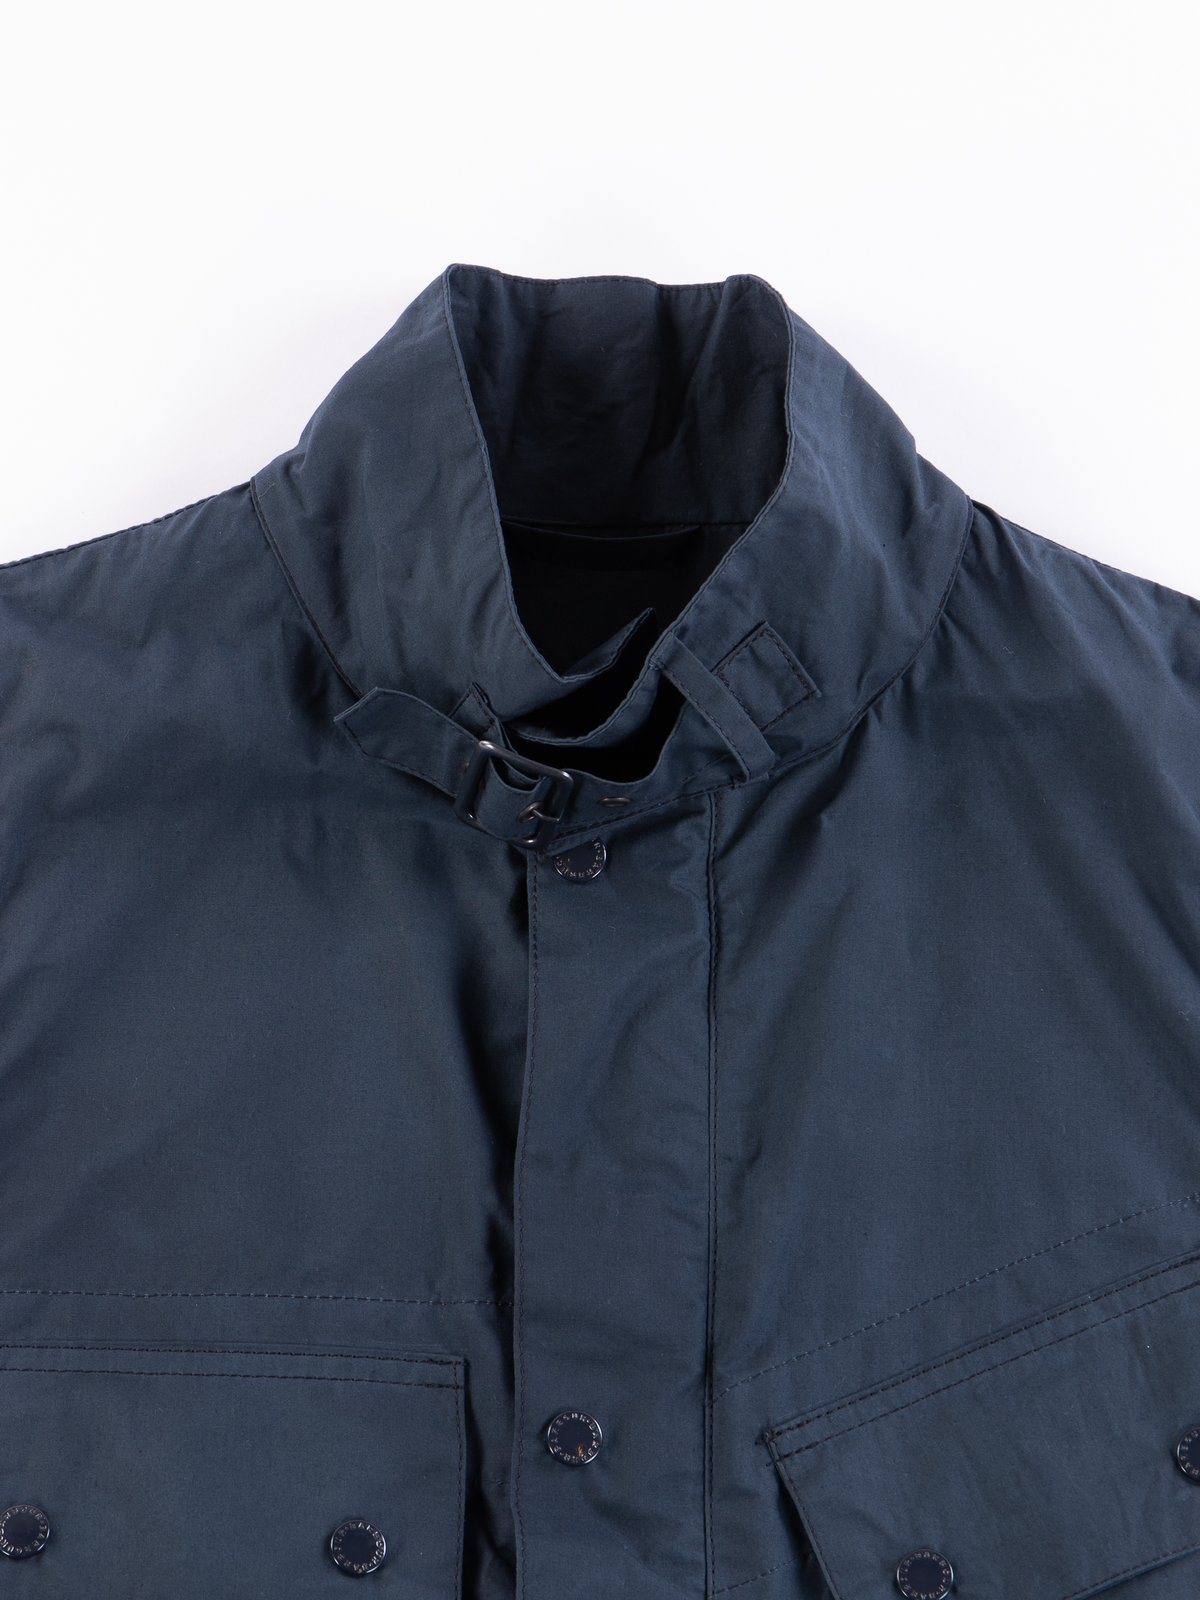 Navy Arthur Vest - Image 3